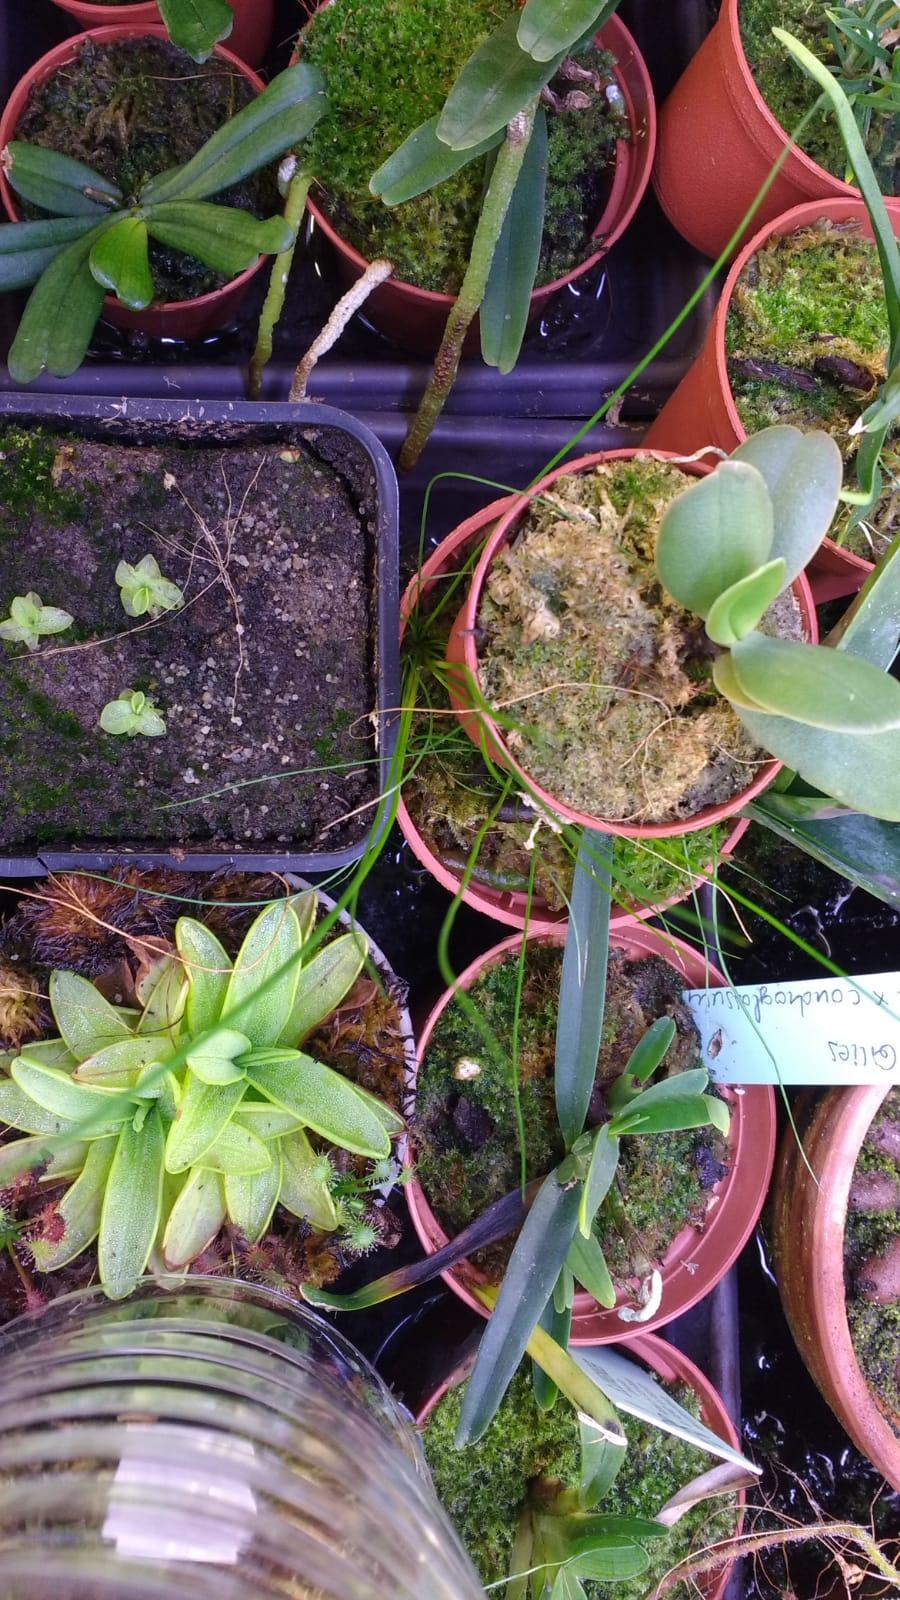 pinguicula primuliflora : repos ou pas Img-2010